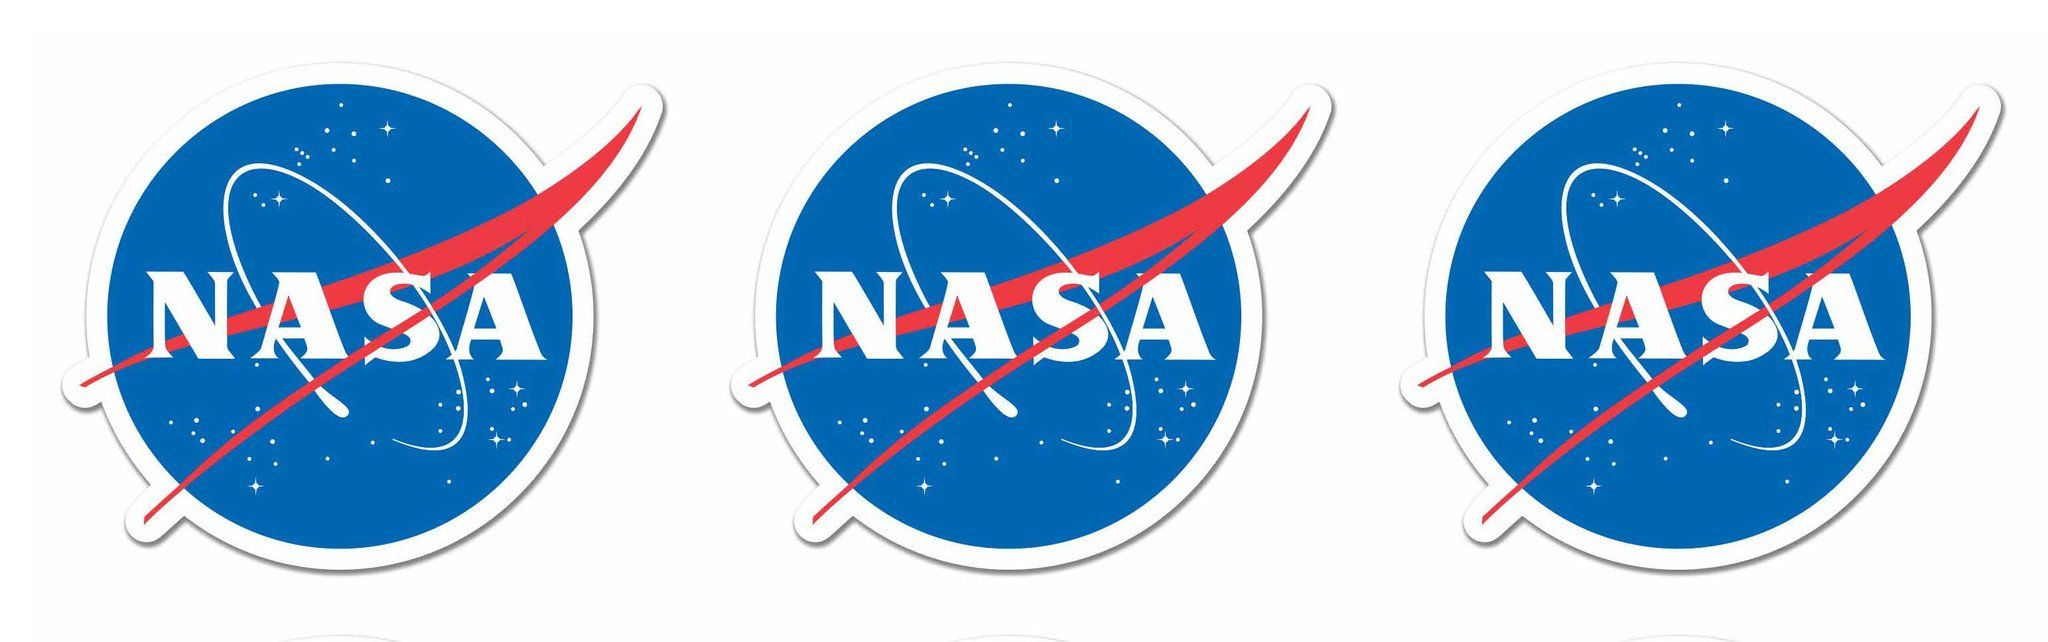 NASA National Aeronautics Space Administration seal logo